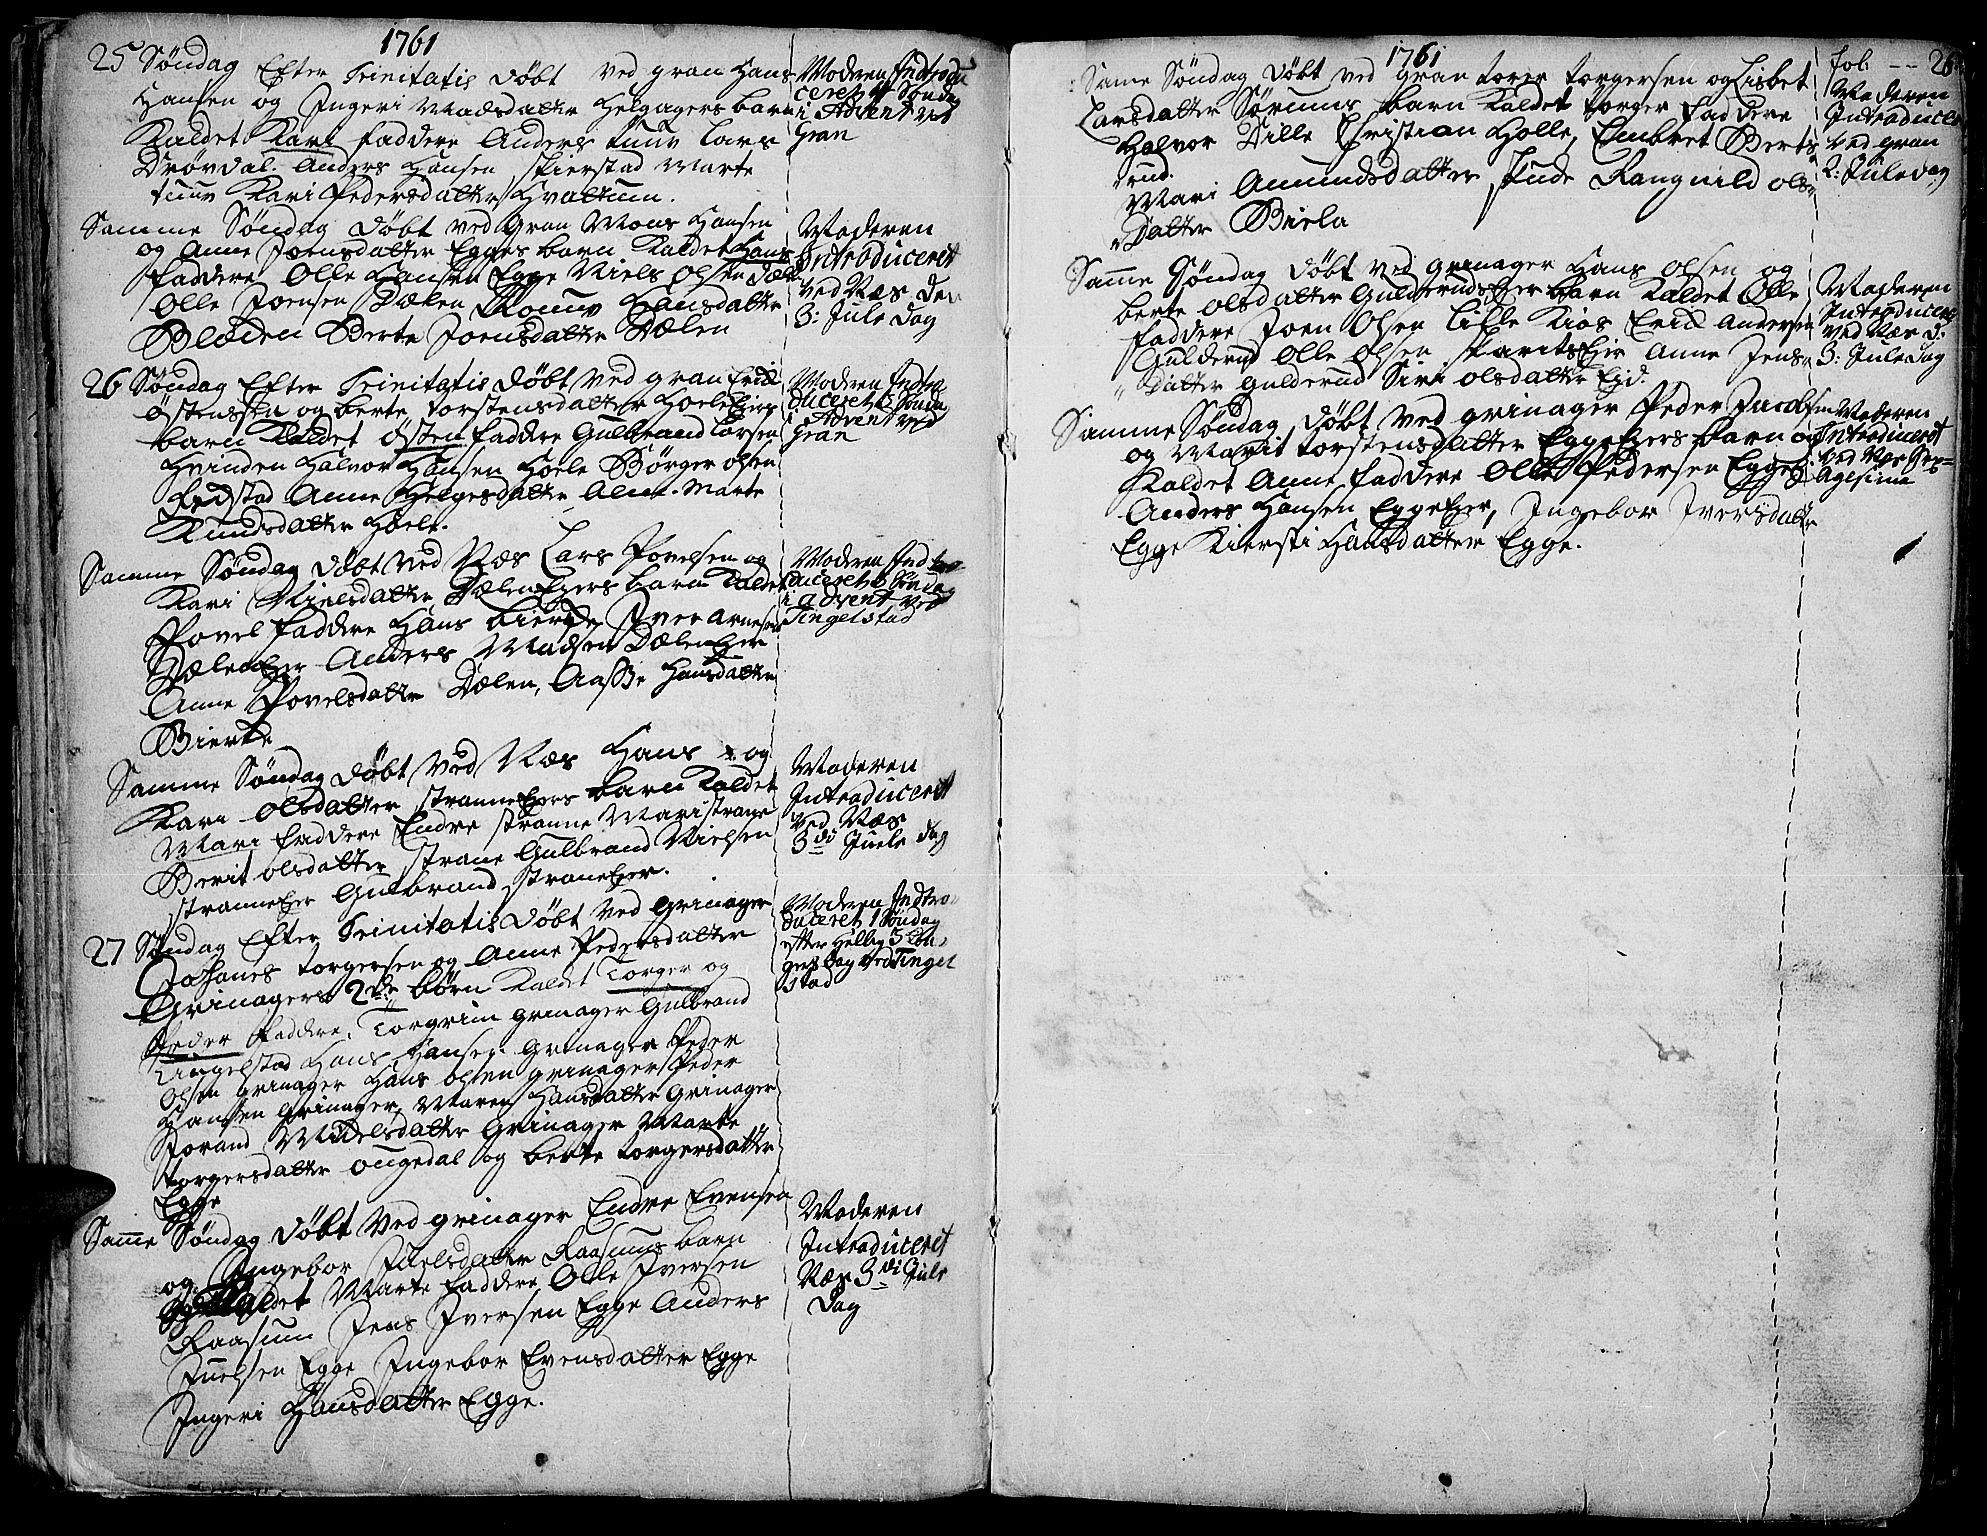 SAH, Gran prestekontor, Ministerialbok nr. 4, 1759-1775, s. 26